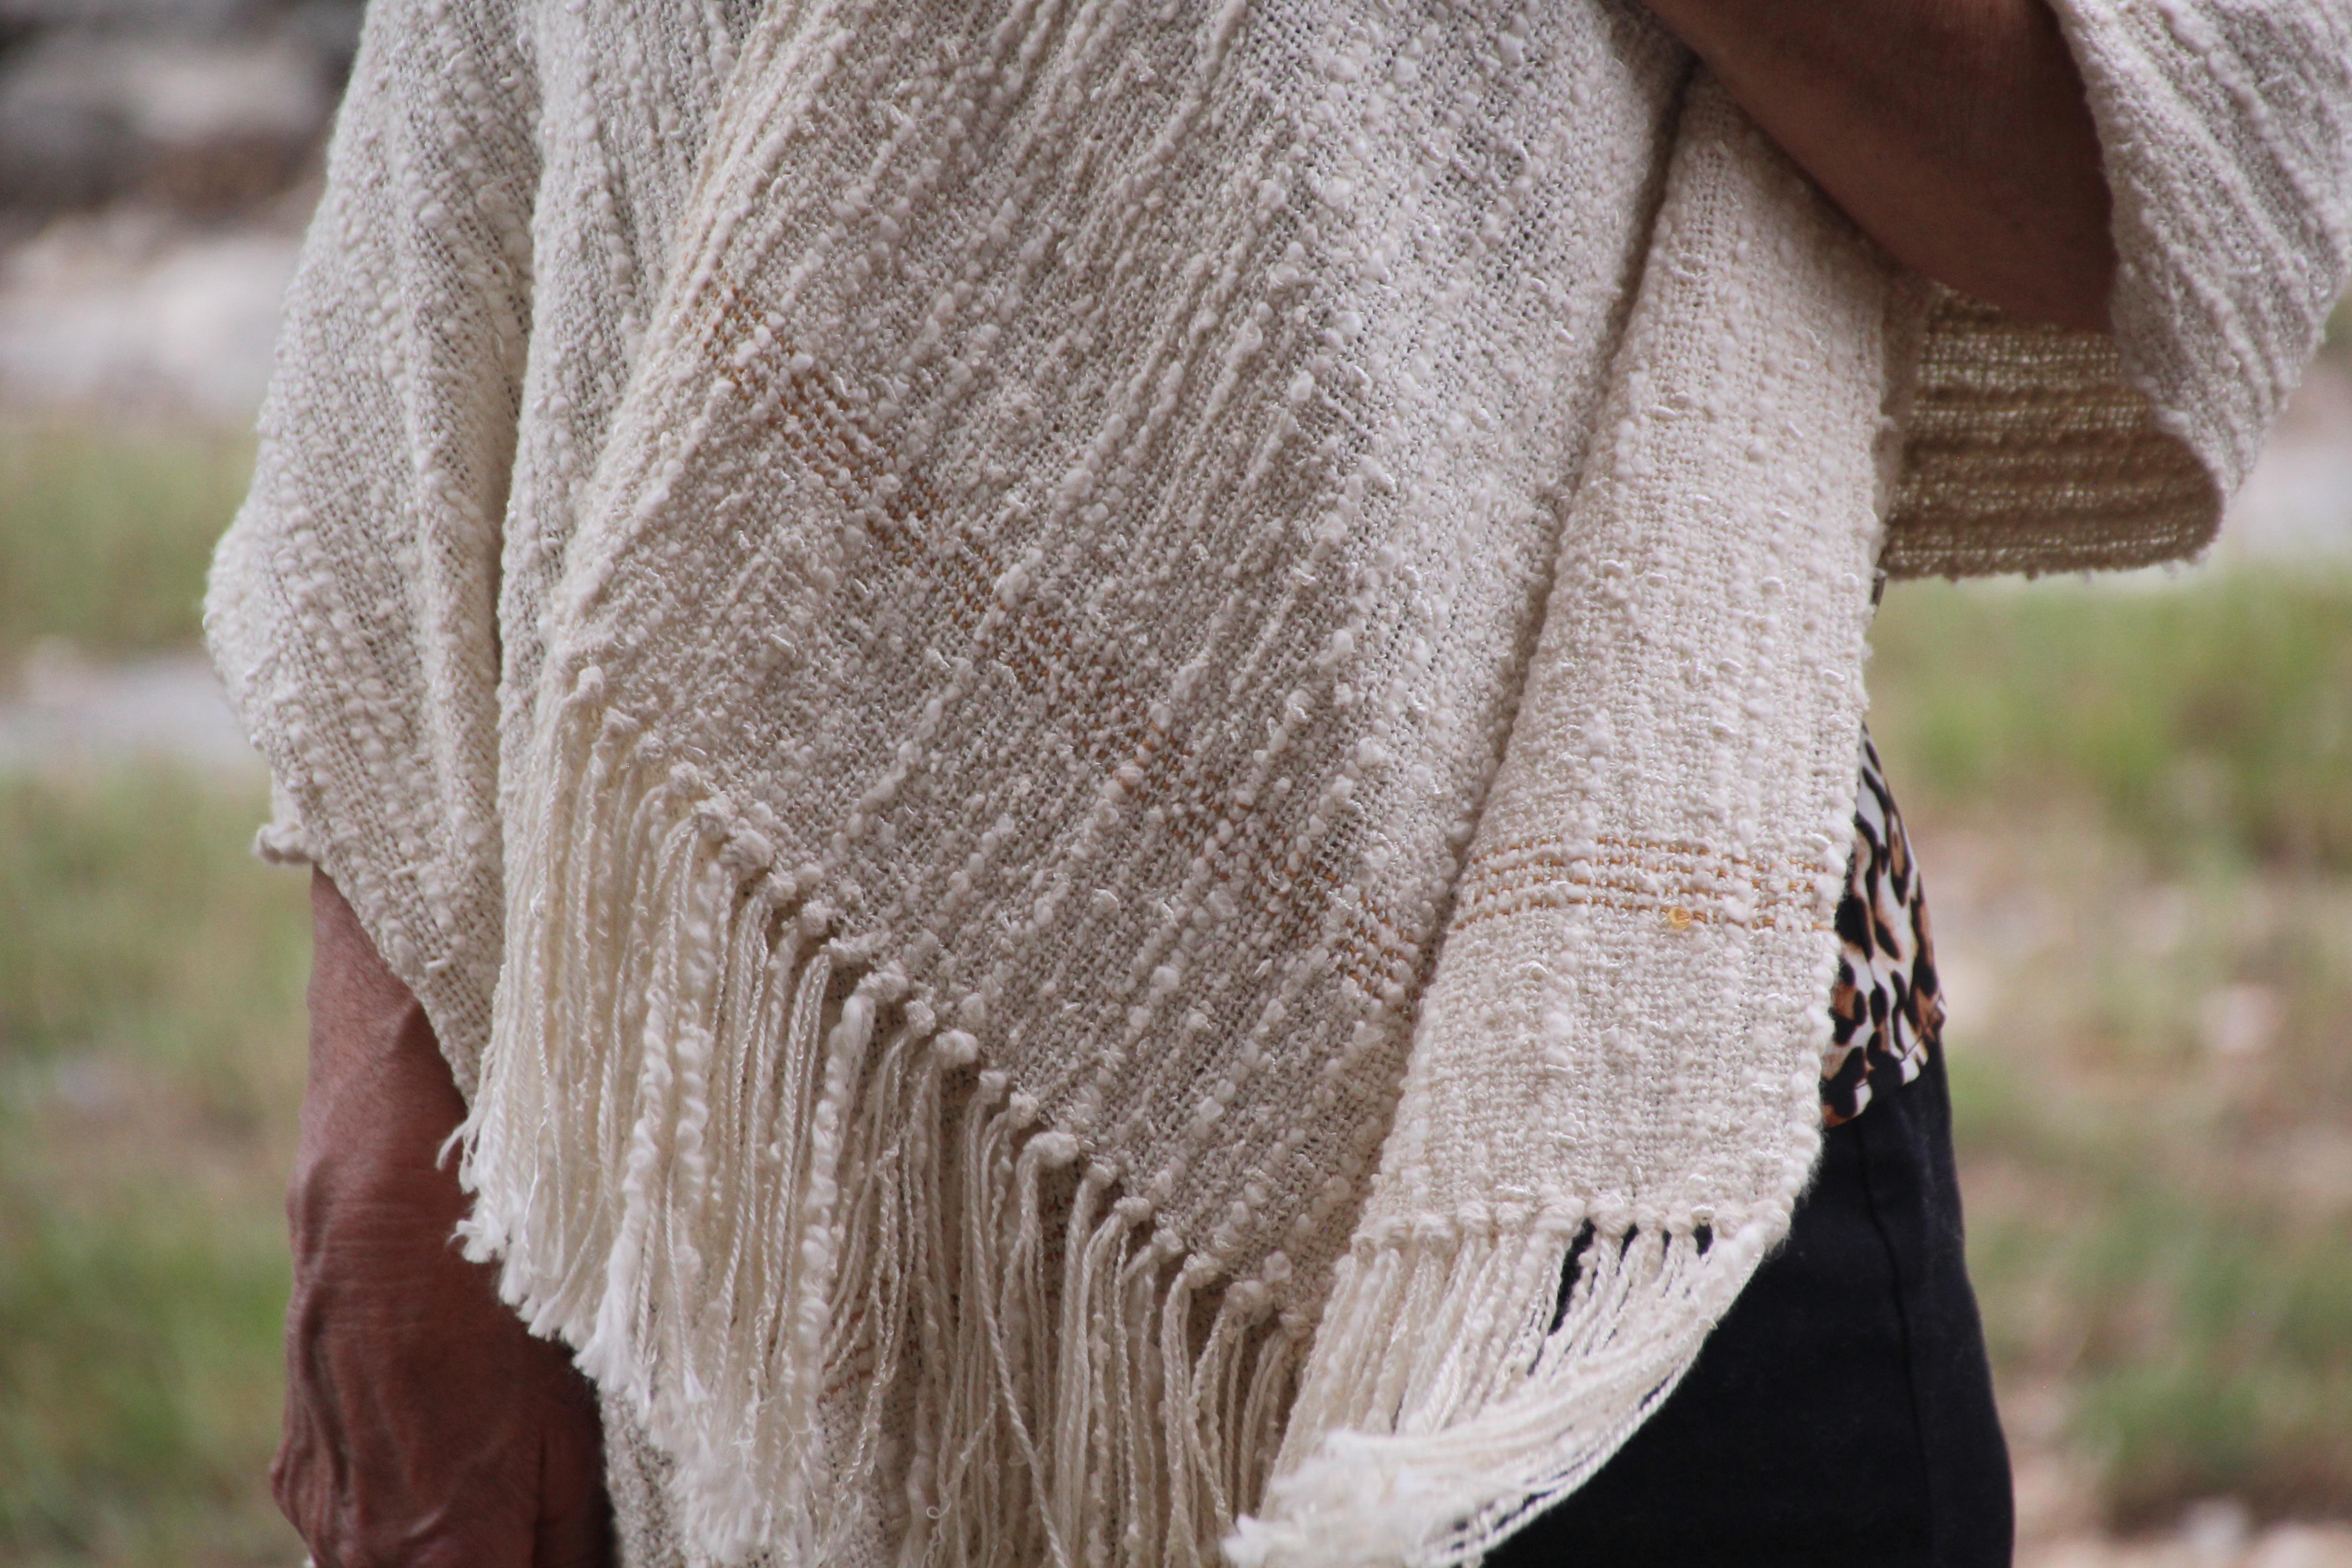 Textured Shawl woven at Homestead Fiber Crafts.